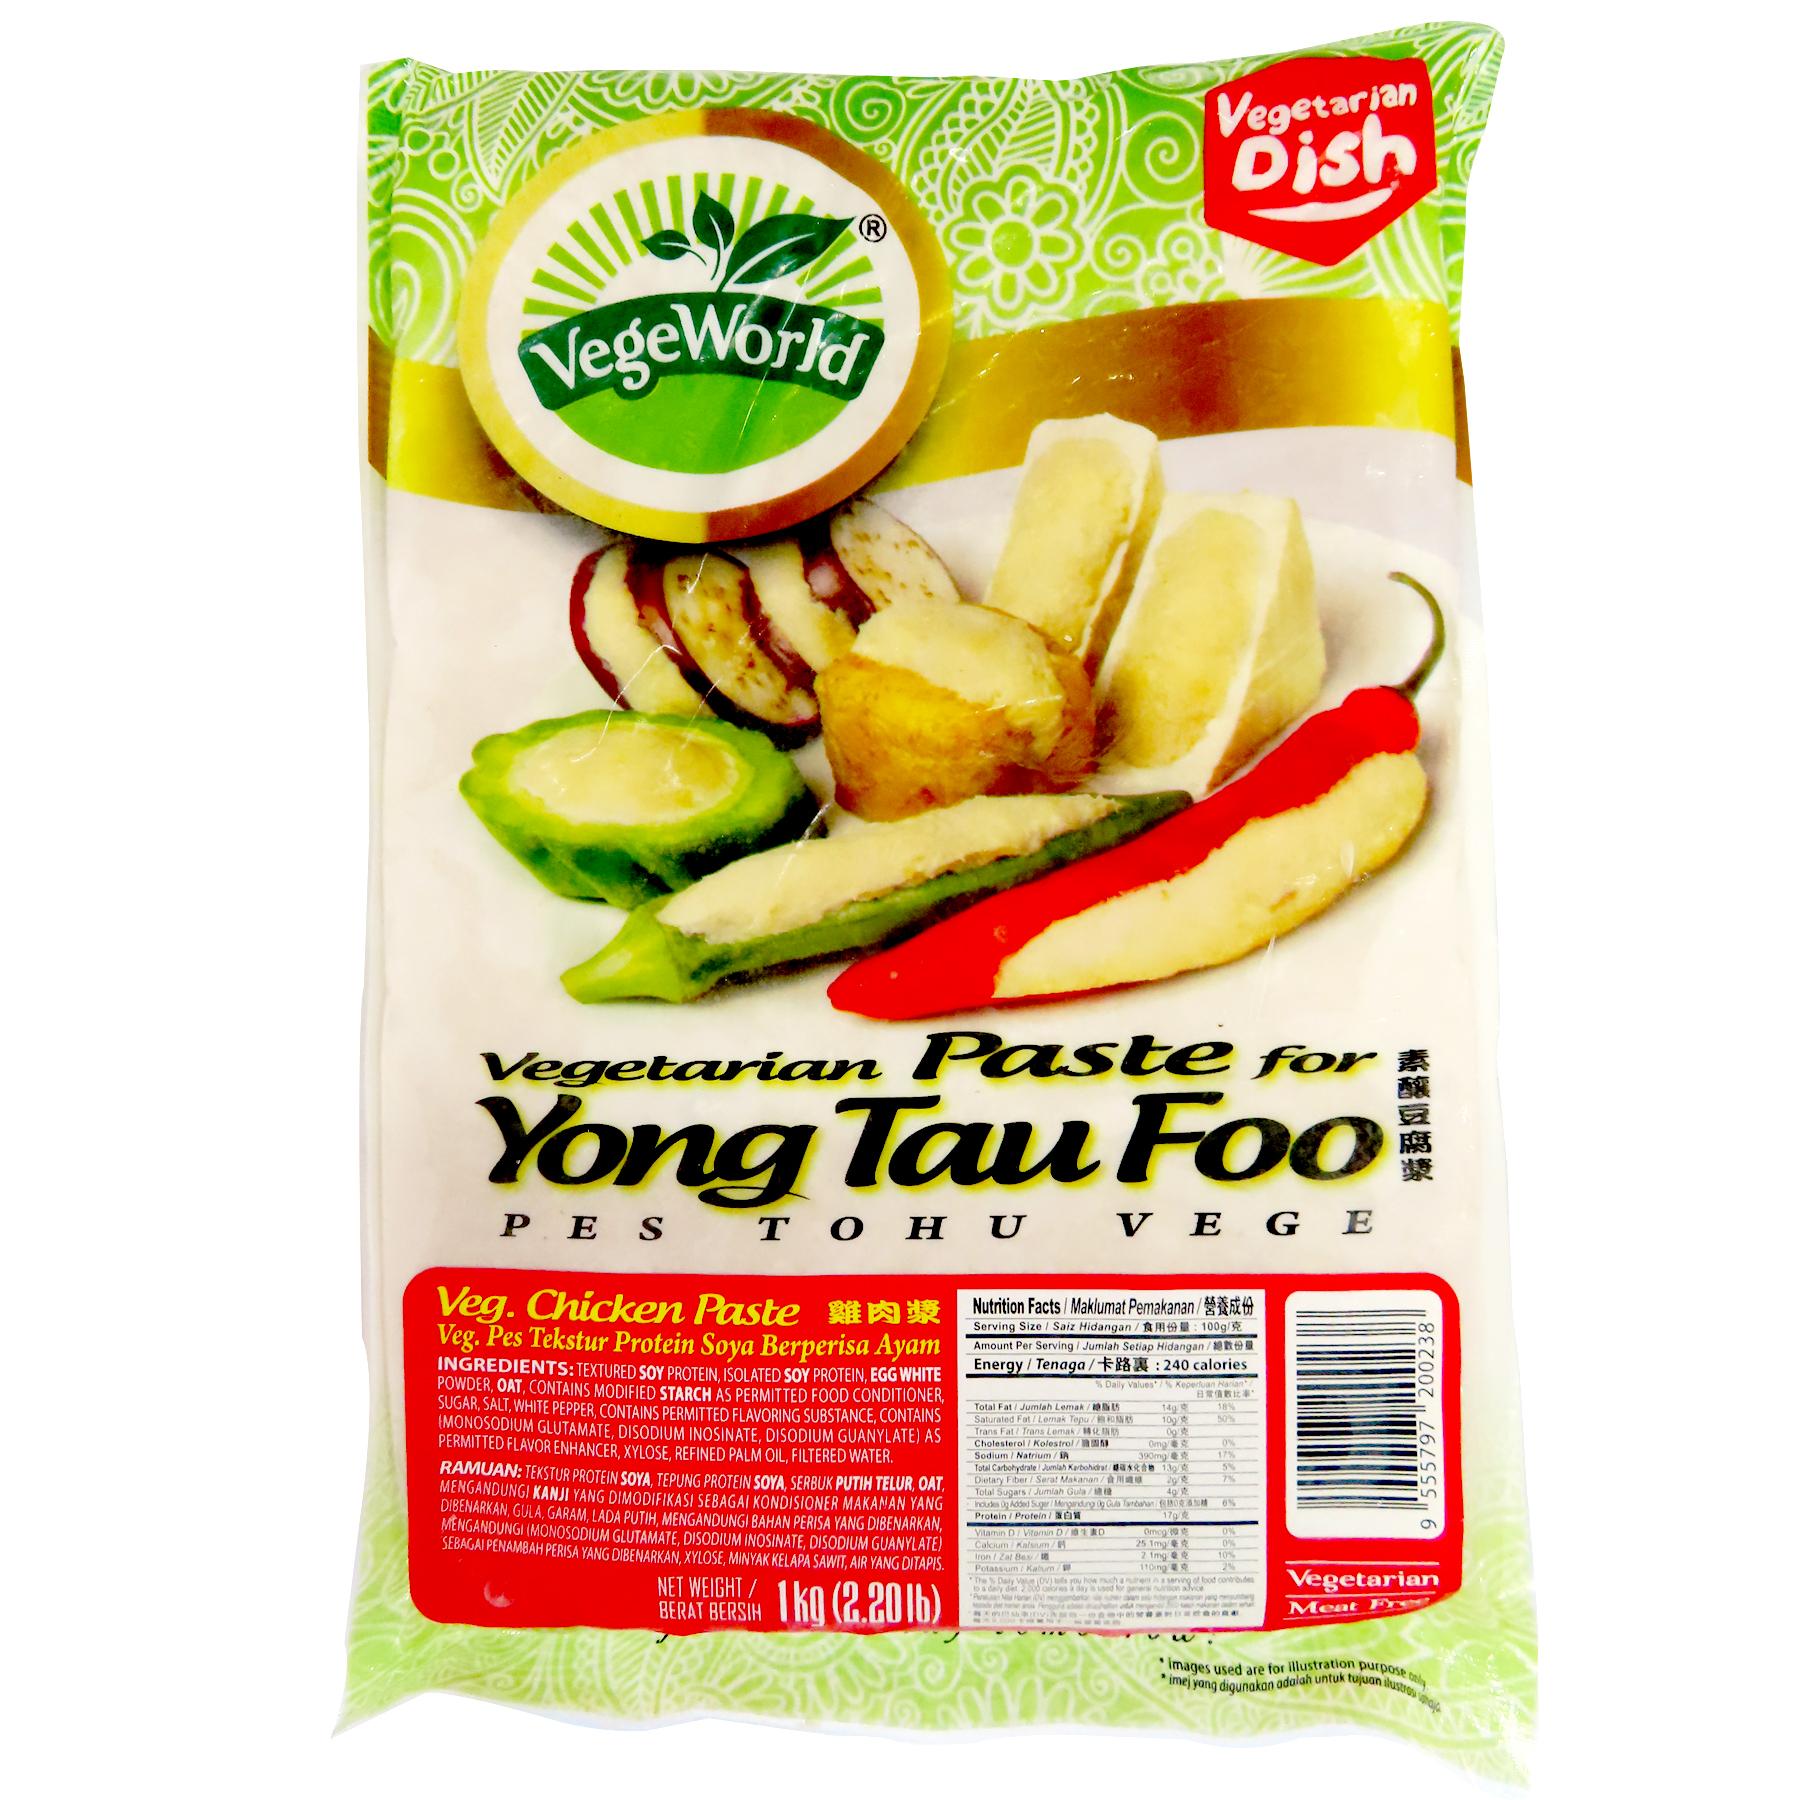 Image Vegeworld Vegetarian Chicken Paste 三阳鸡肉酱1000grams